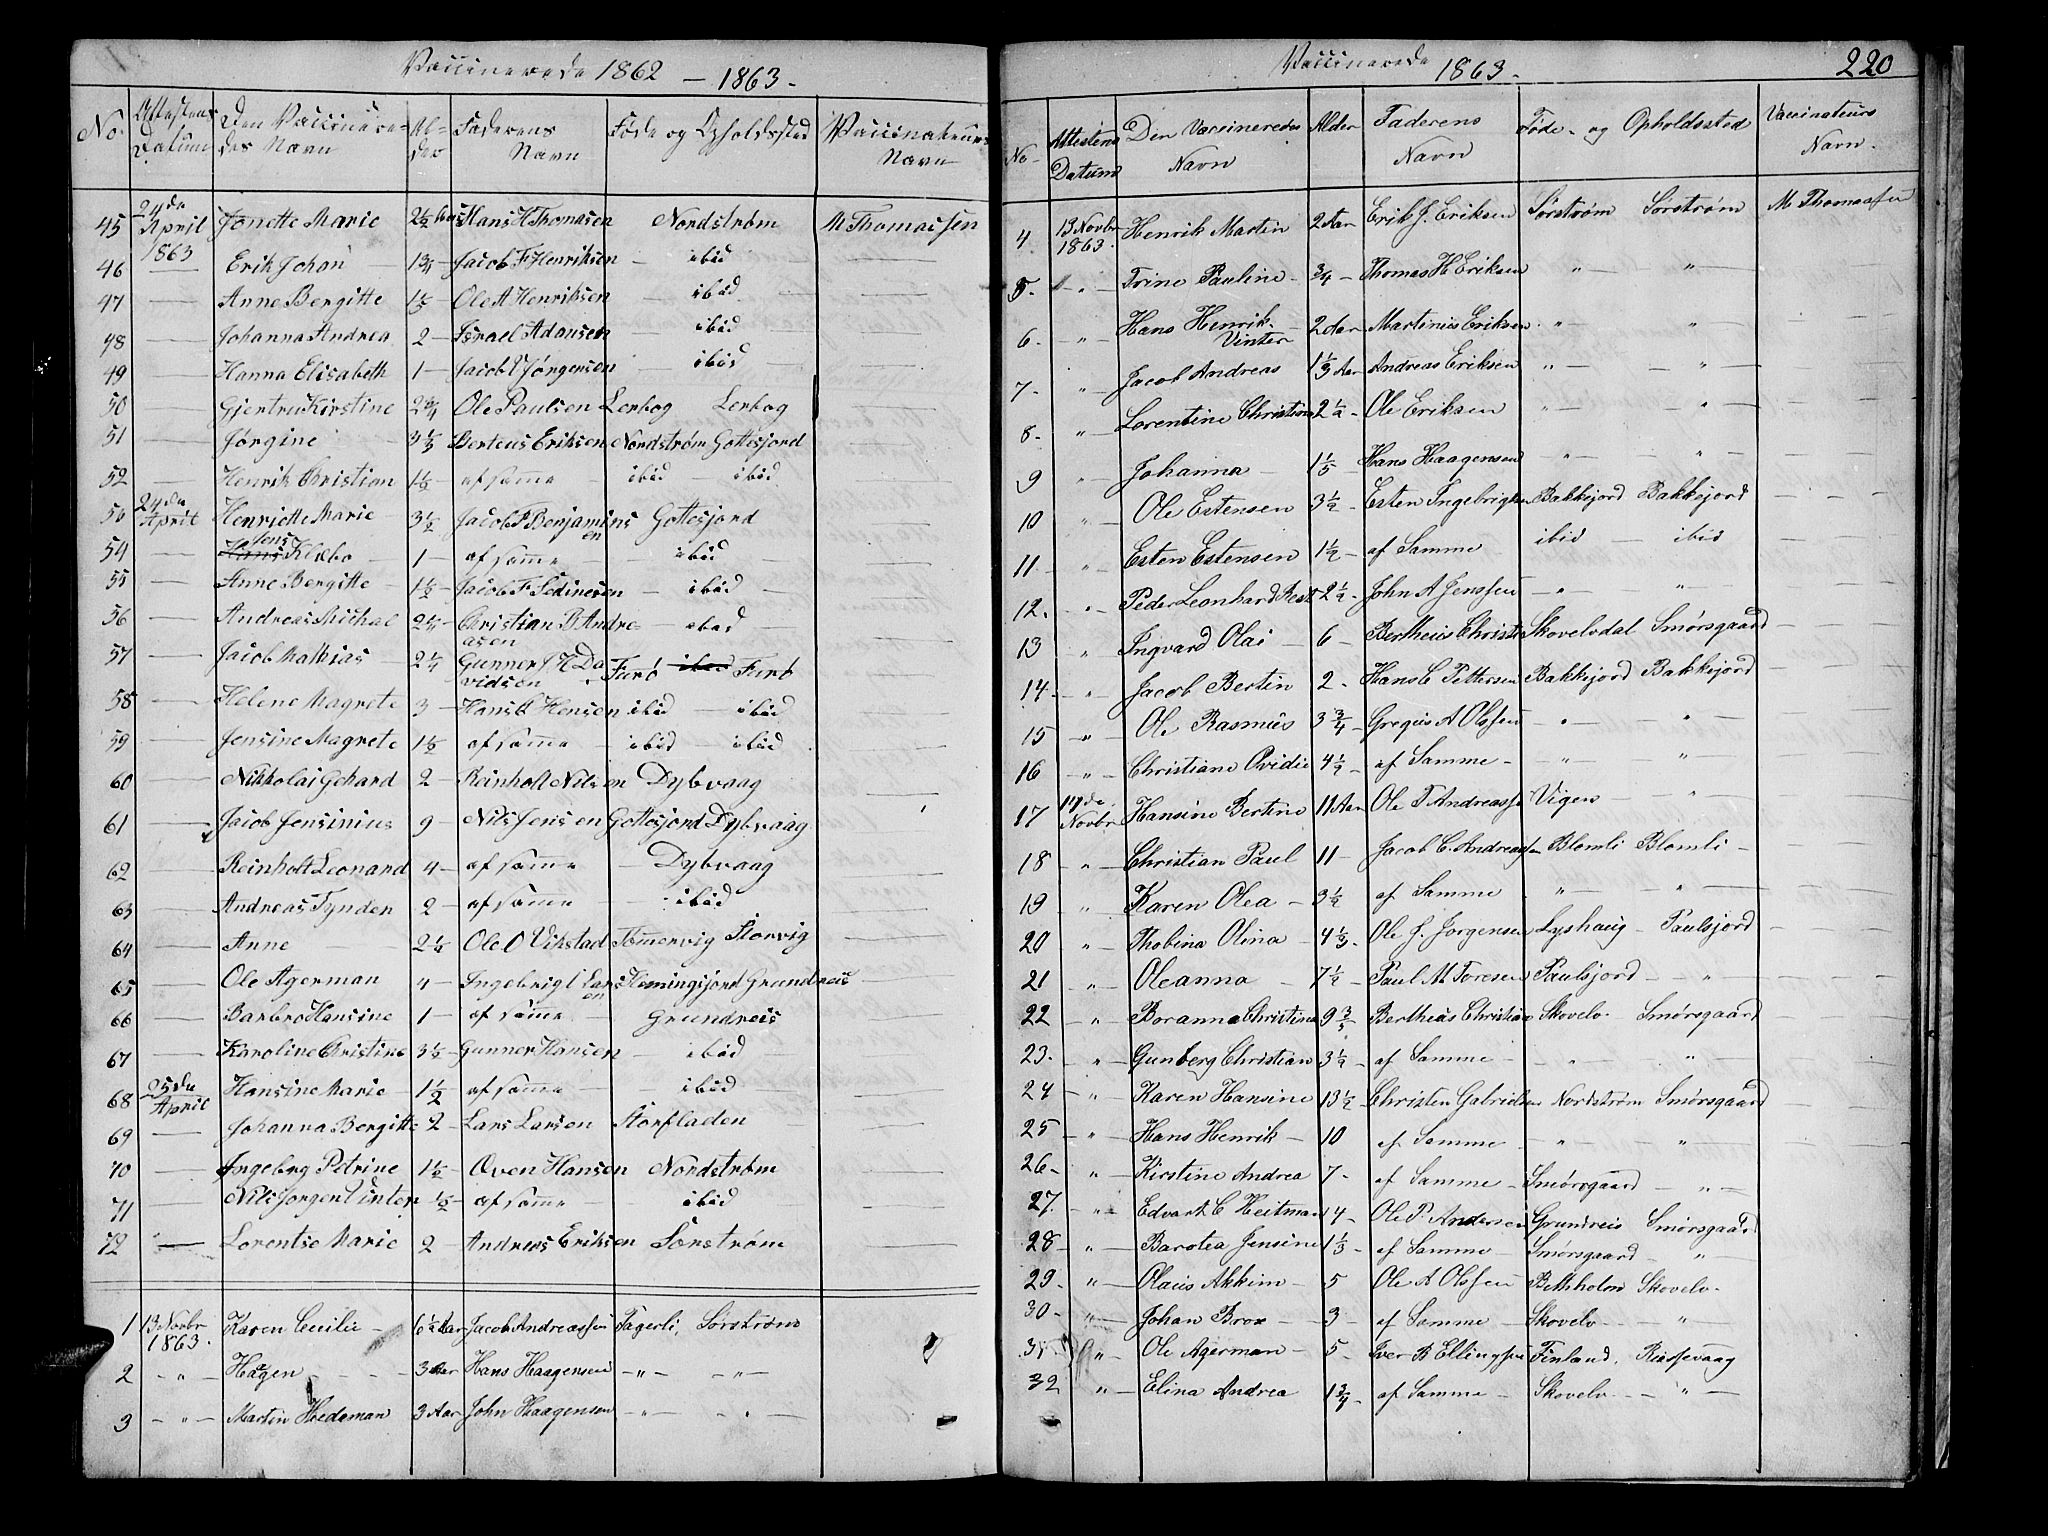 SATØ, Tranøy sokneprestkontor, I/Ia/Iab/L0021klokker: Klokkerbok nr. 21, 1861-1886, s. 220